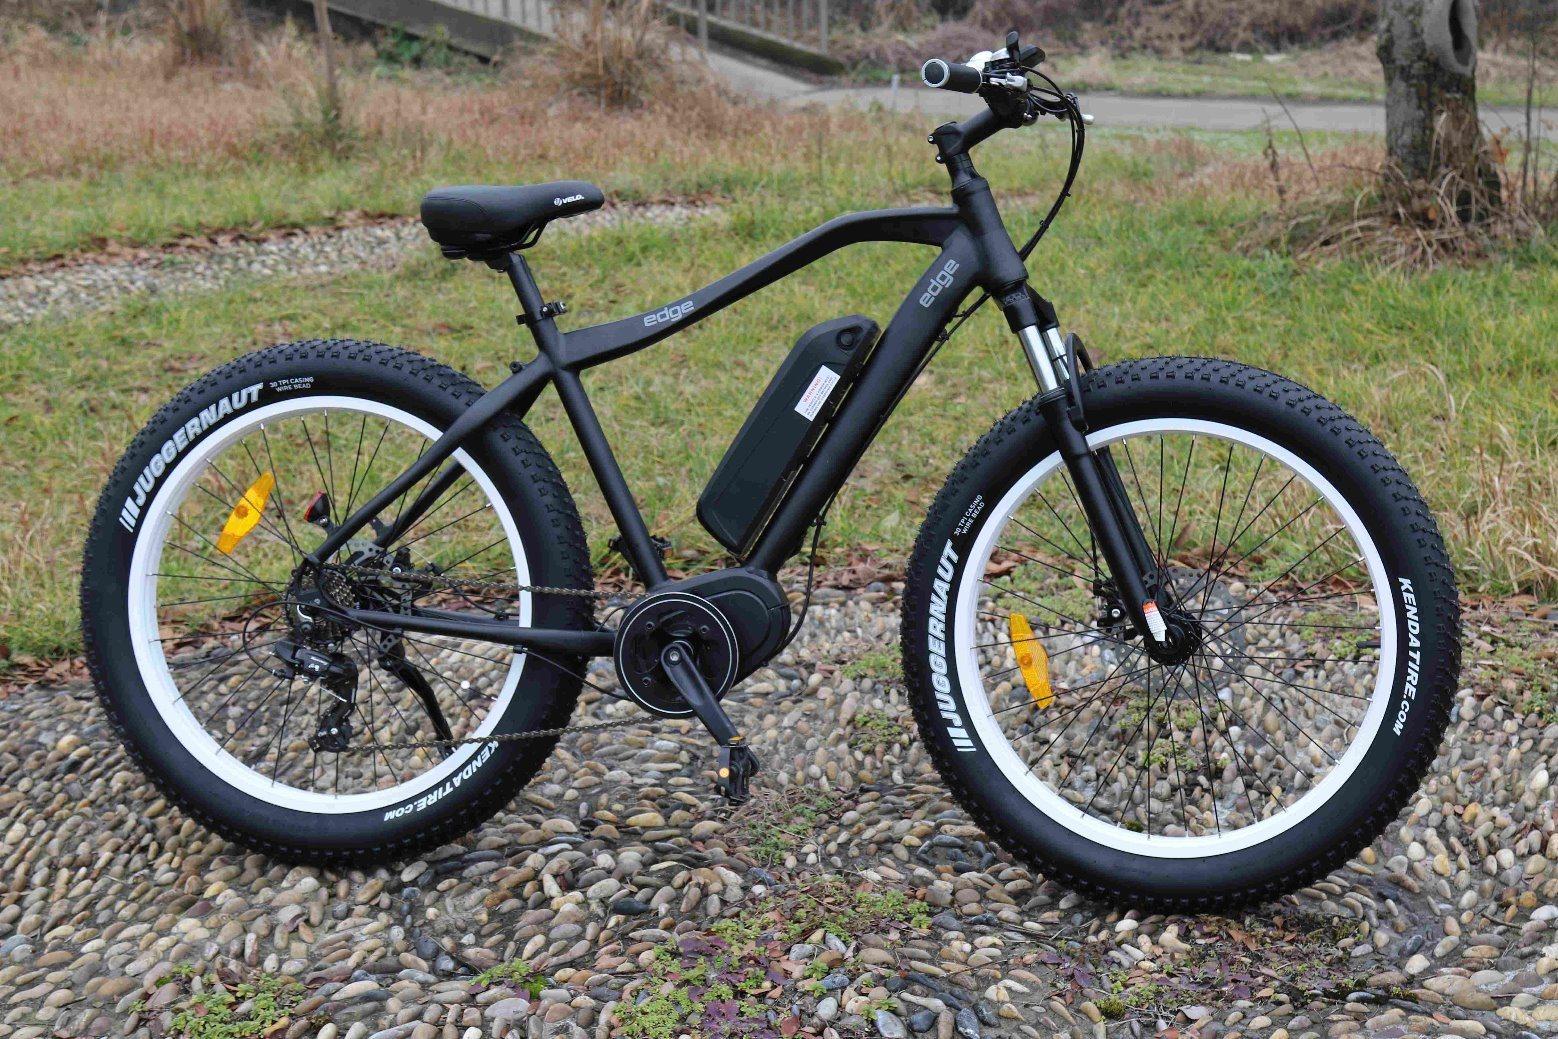 250W Bafang MID Motor Fat Tire Mountain Electric Bike